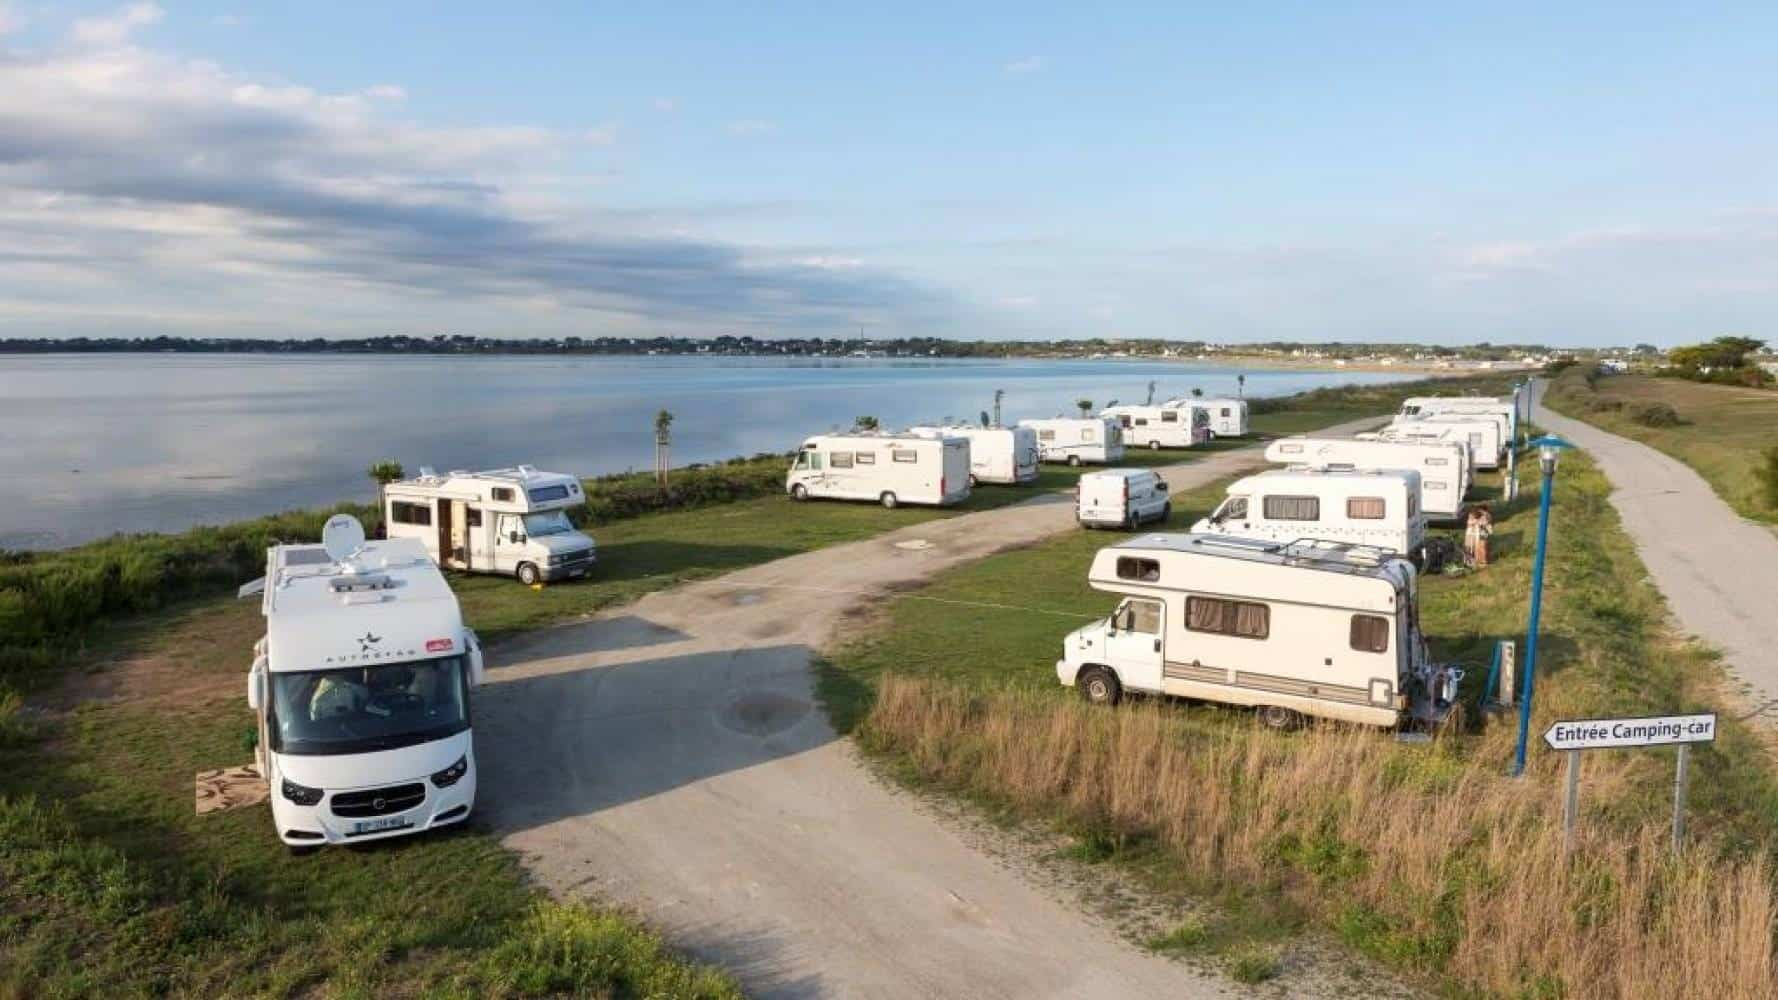 Aire de camping car en France Plouharnel